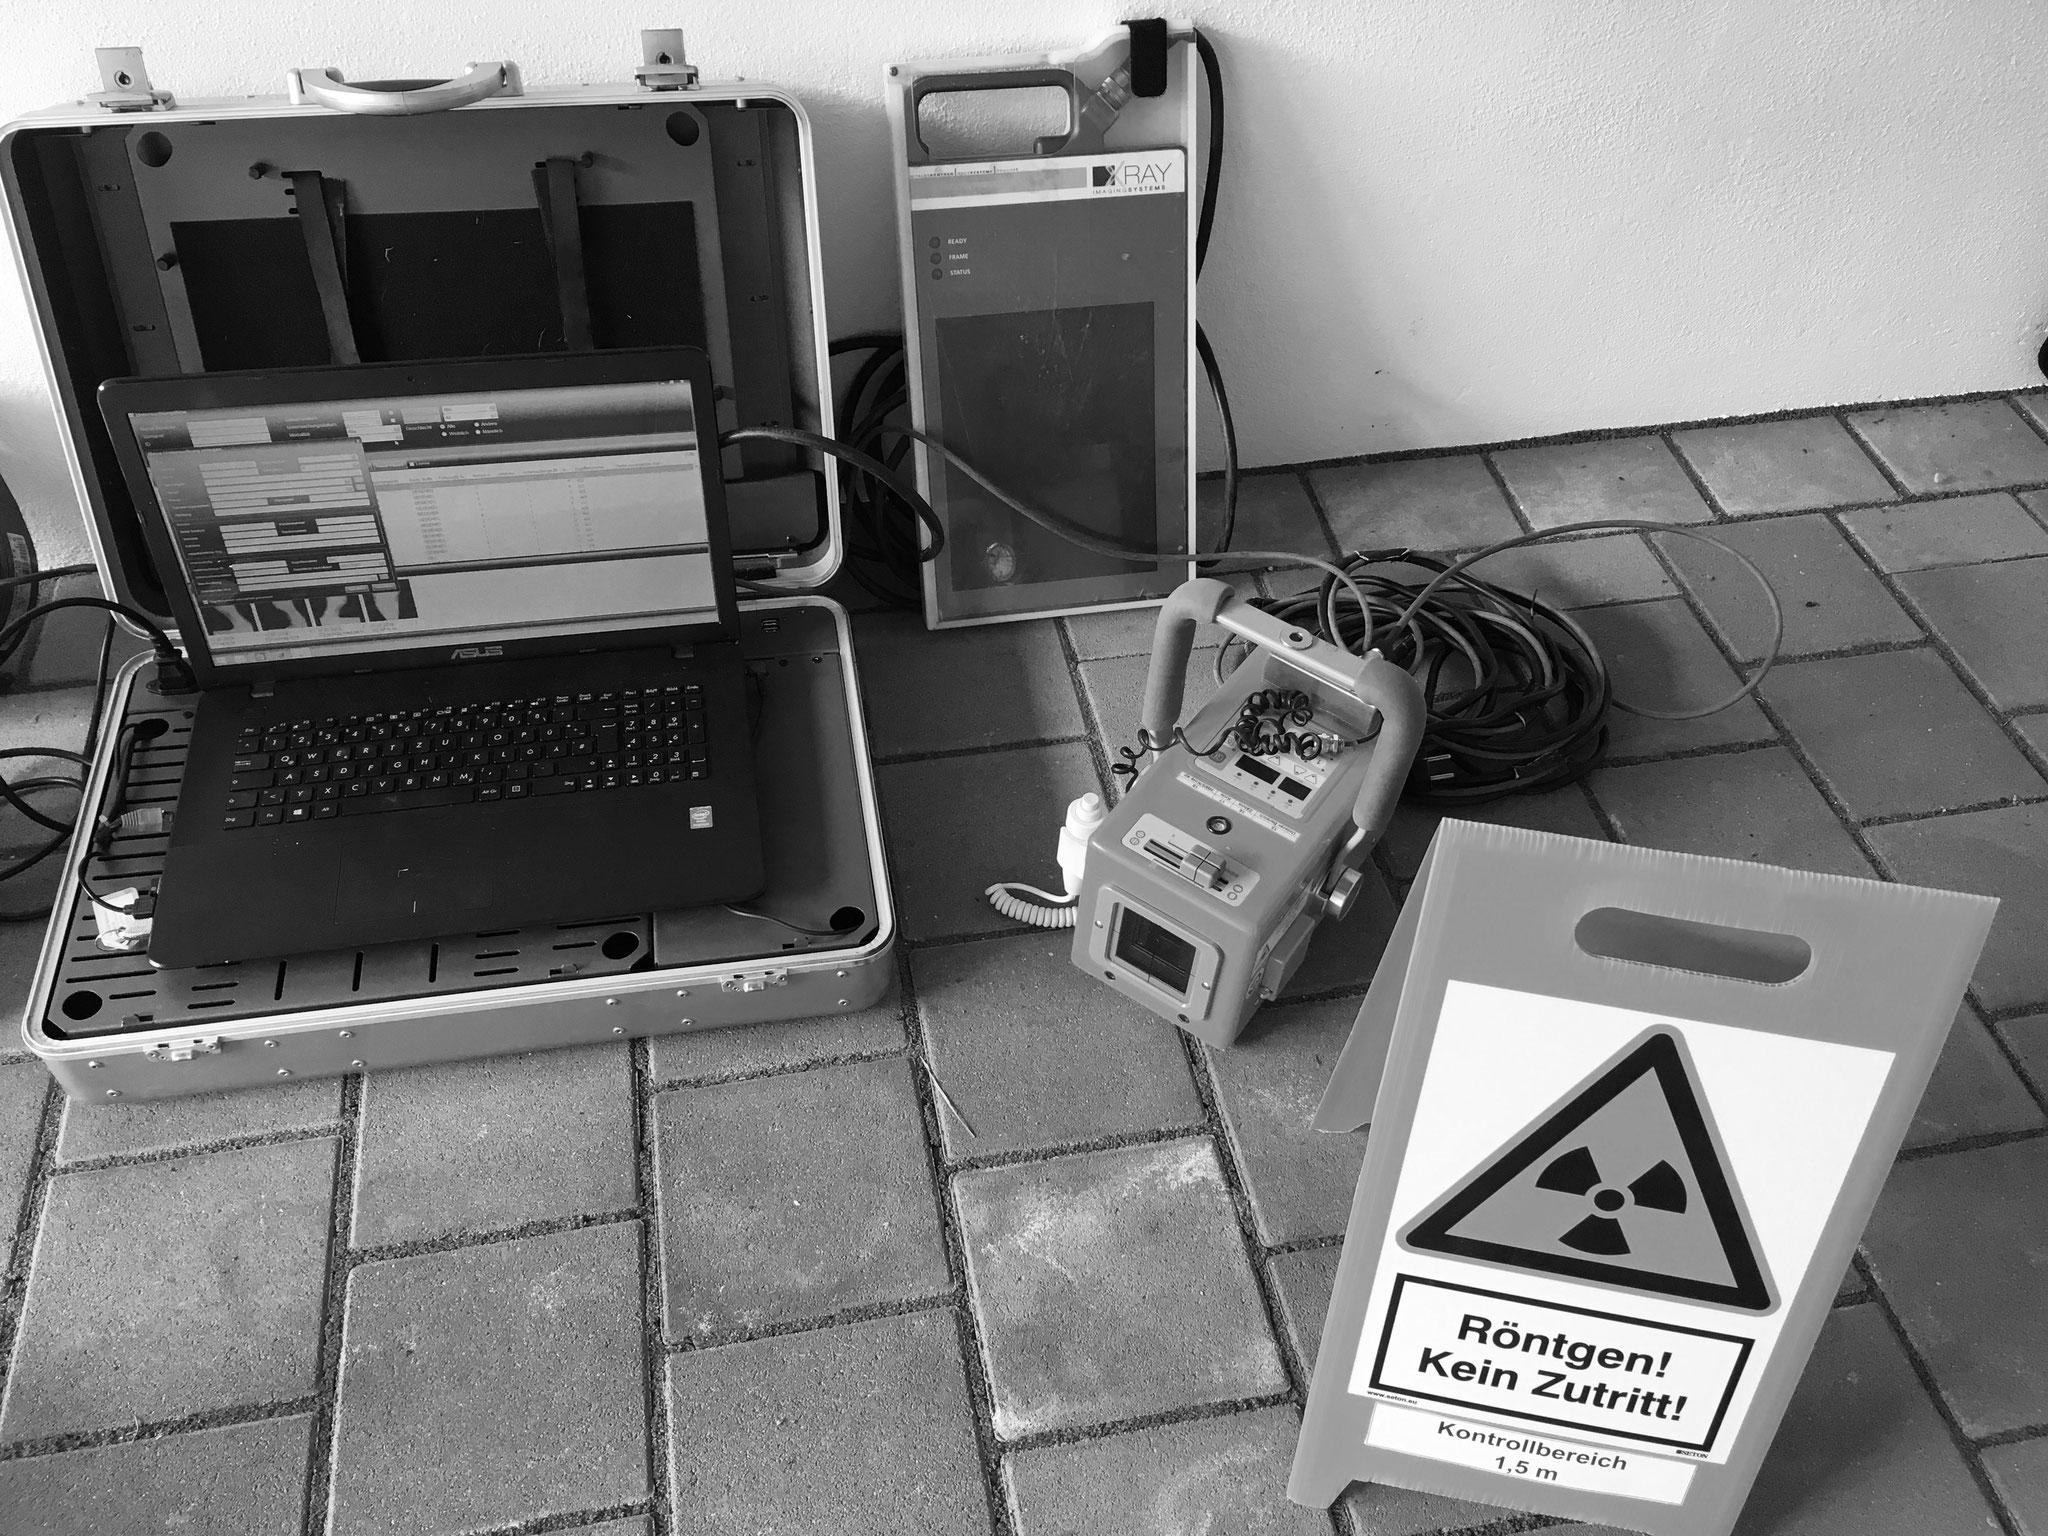 Mobile Röntgenanlage für bildgebende Diagnostik